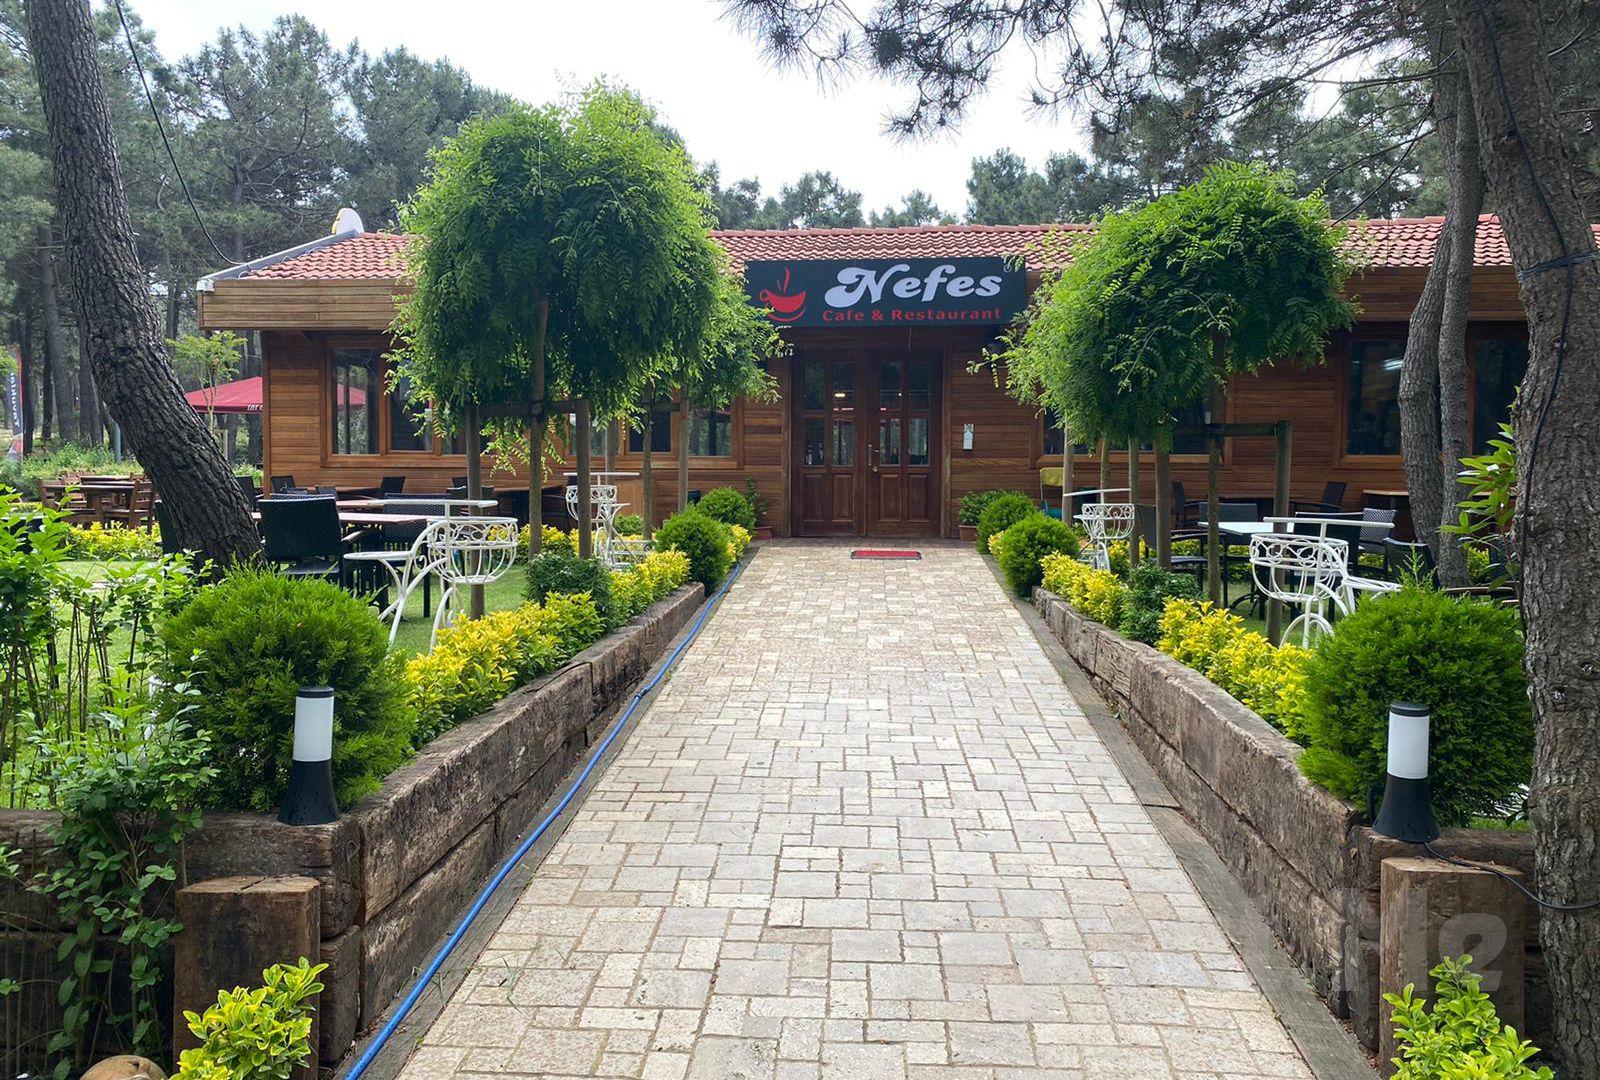 Nefes Cafe ve Restaurant